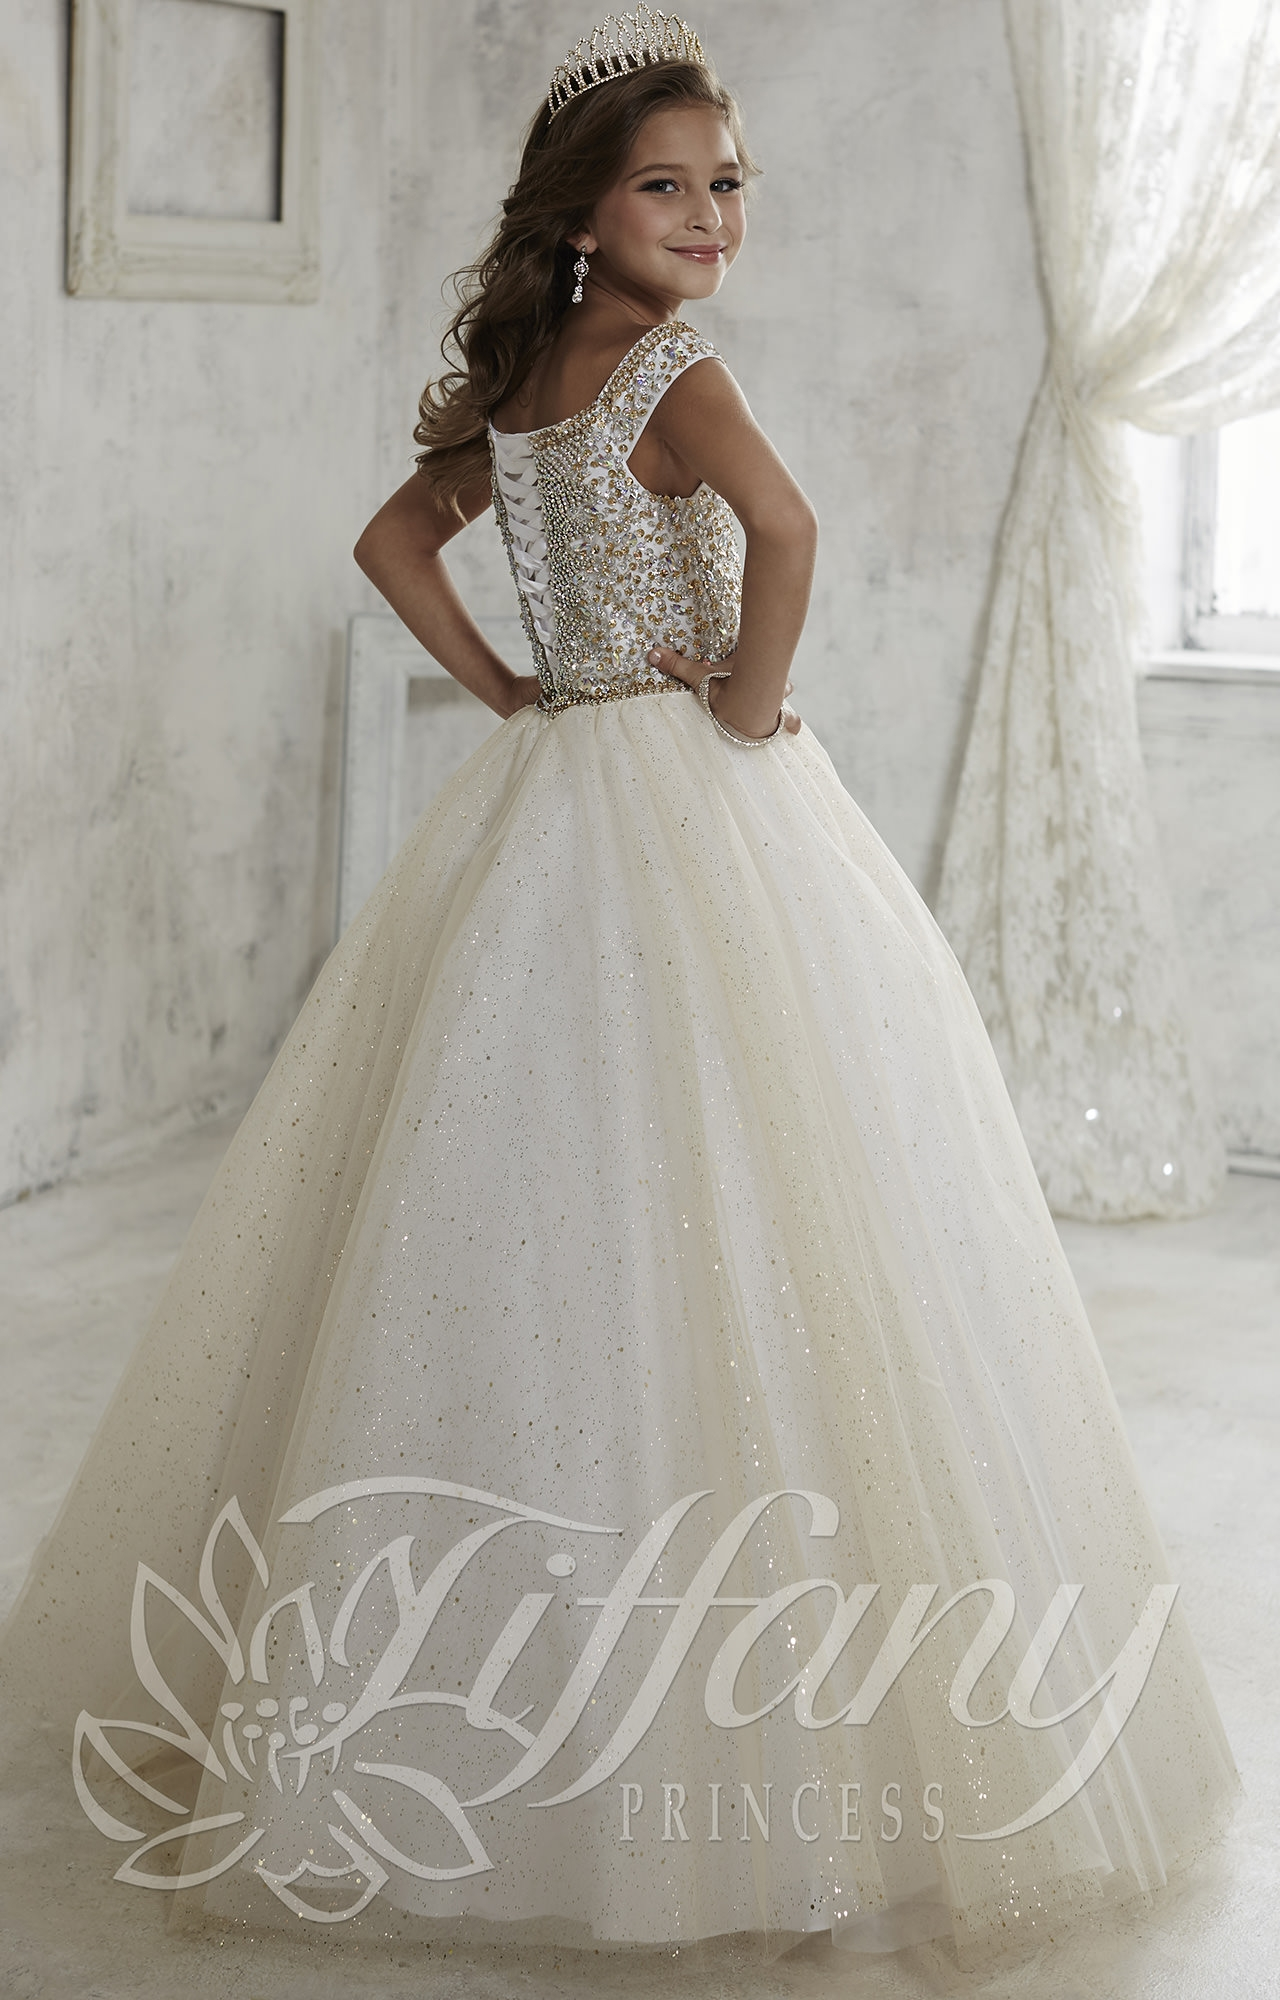 Tiffany Princess 13457 Princess Grace Gown Prom Dress